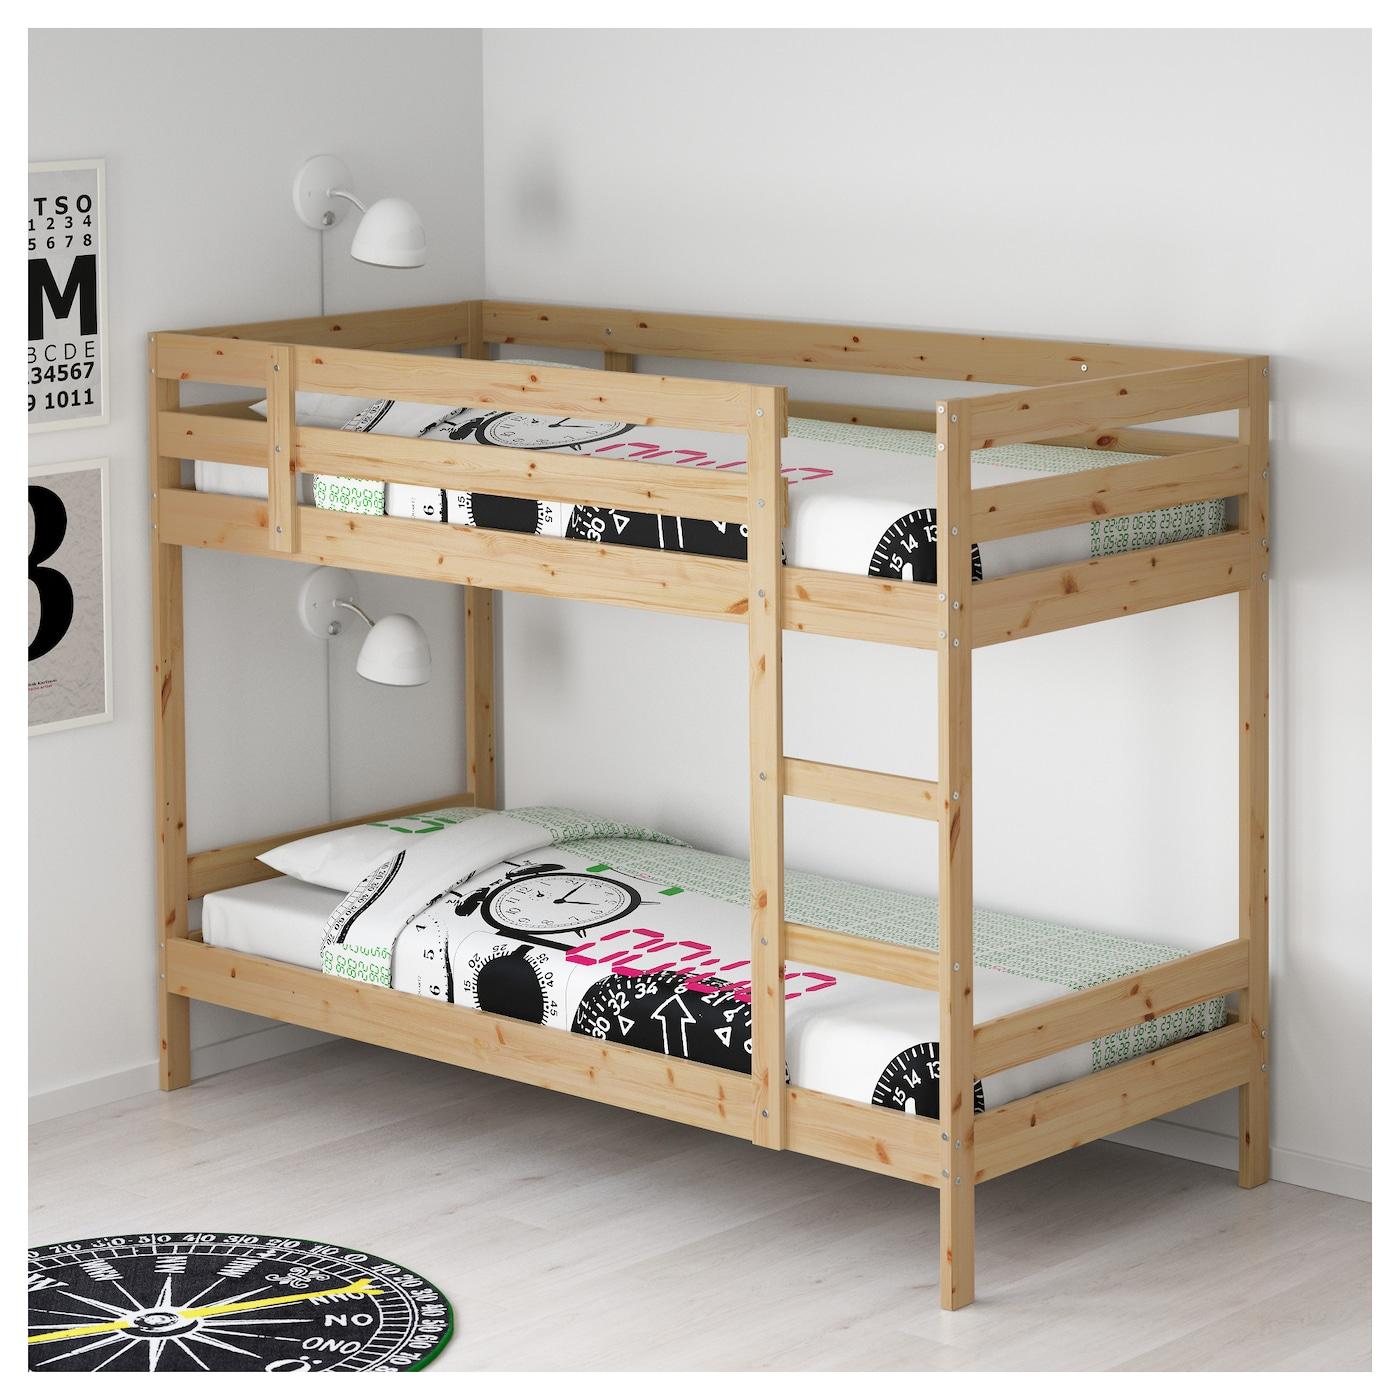 mydal frame stapelbed grenen 90x200 cm ikea. Black Bedroom Furniture Sets. Home Design Ideas